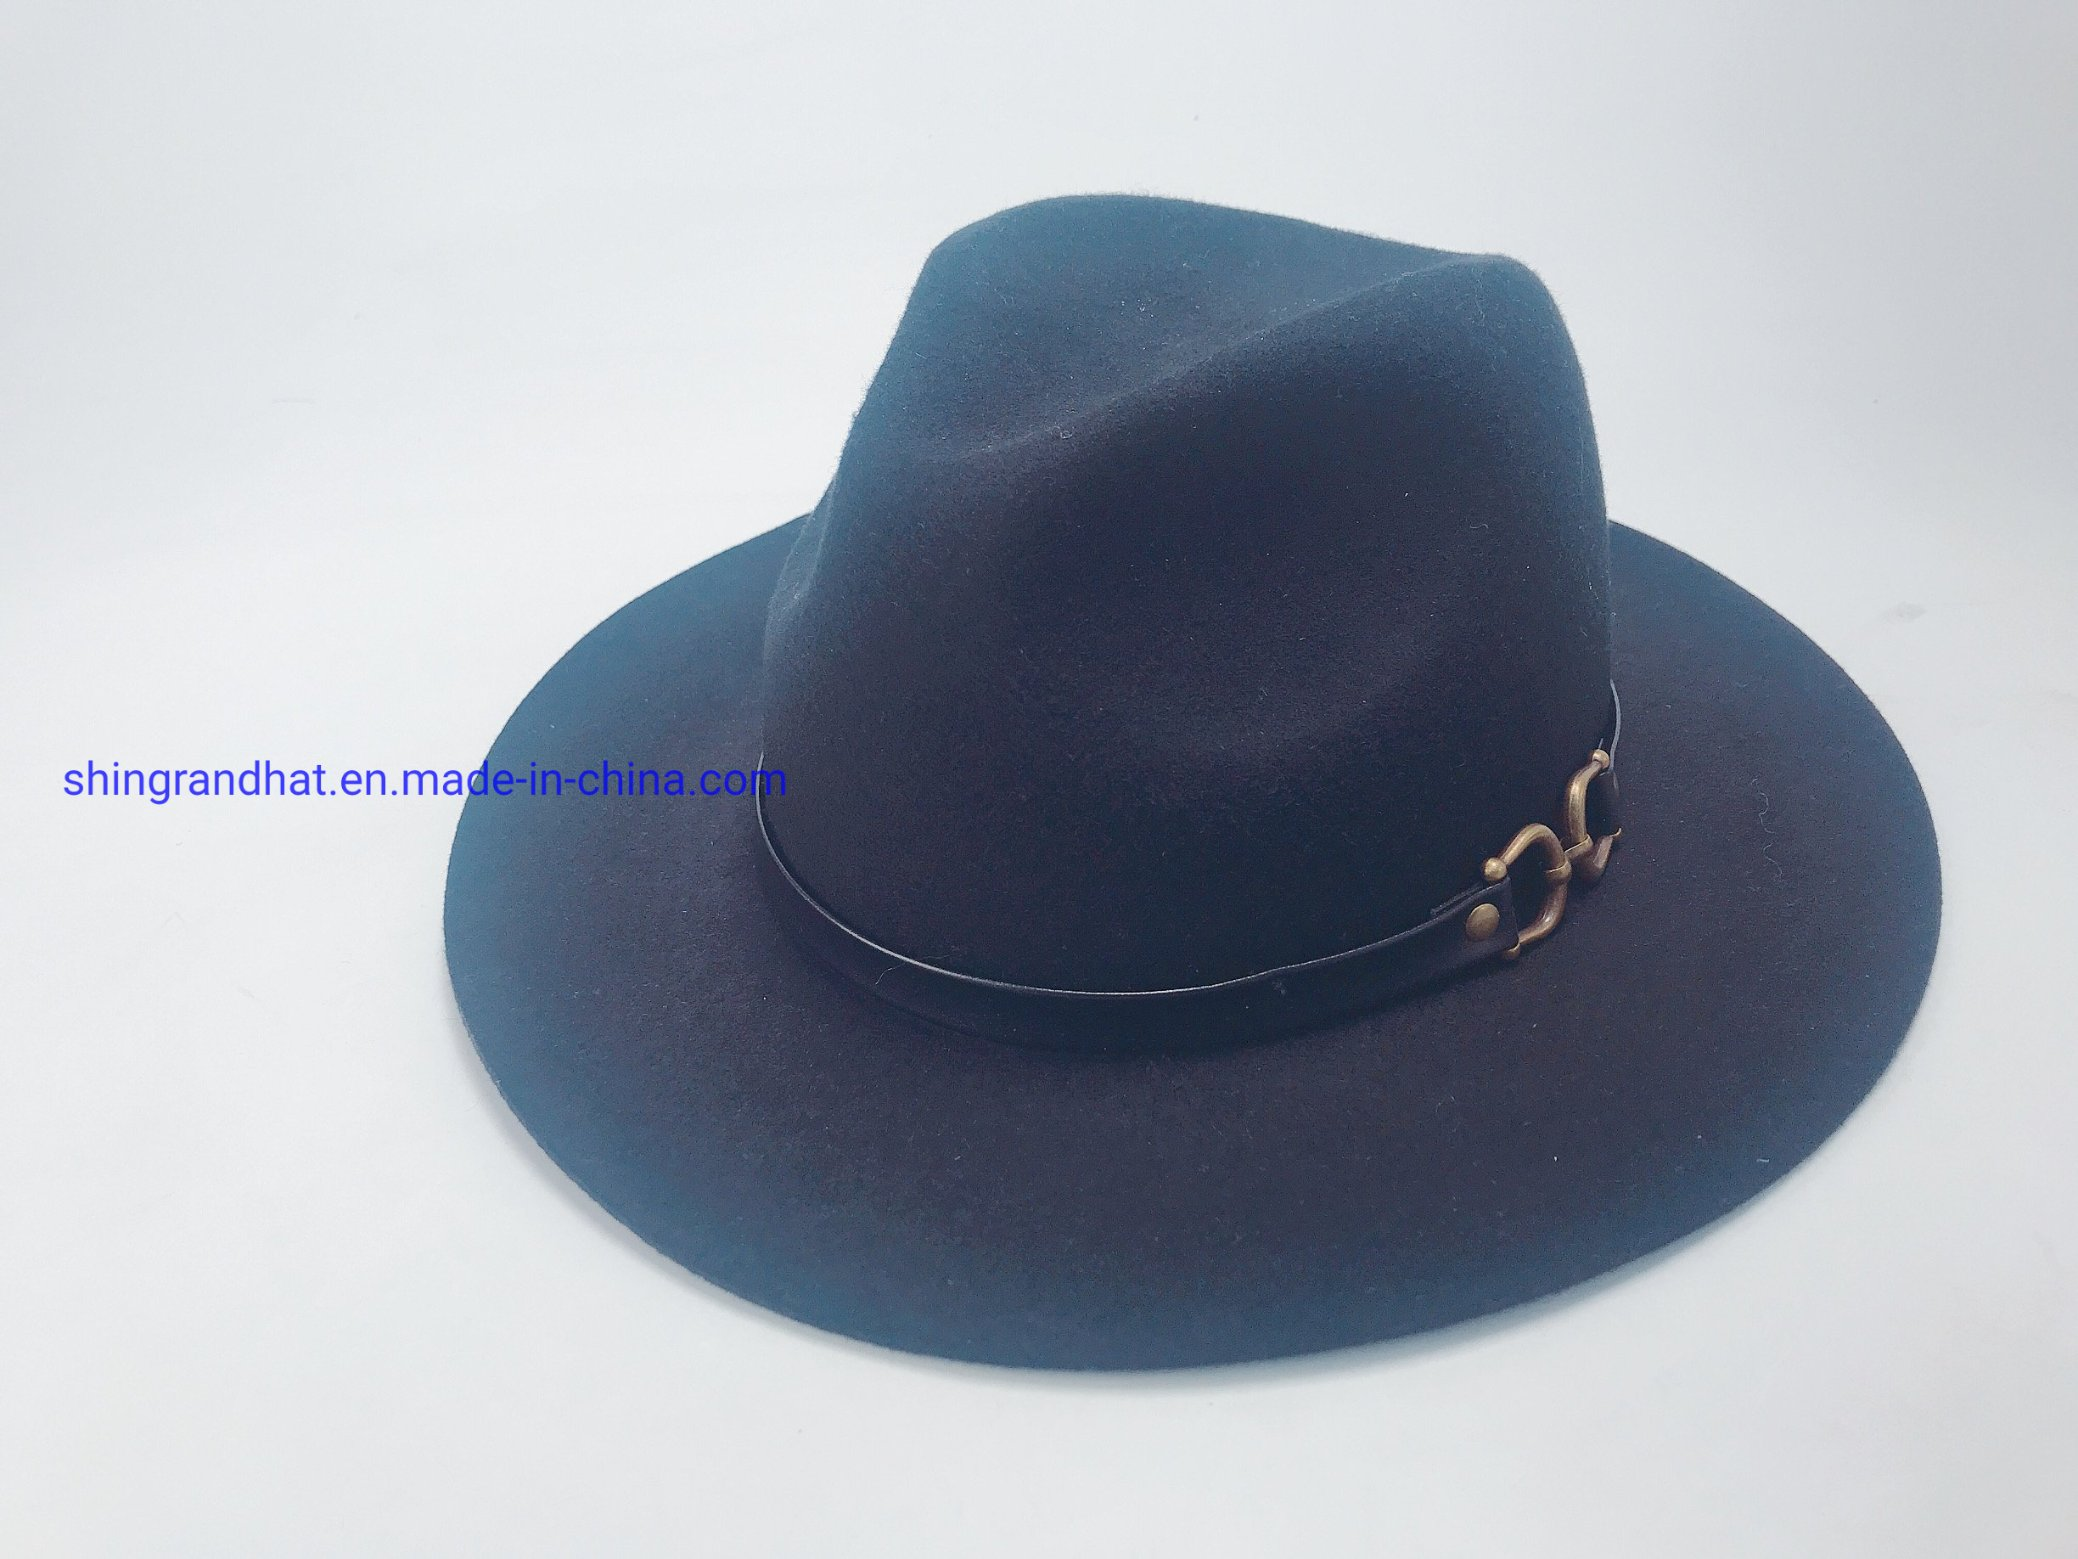 Shingrand Hats Manufacturer Co., Ltd.